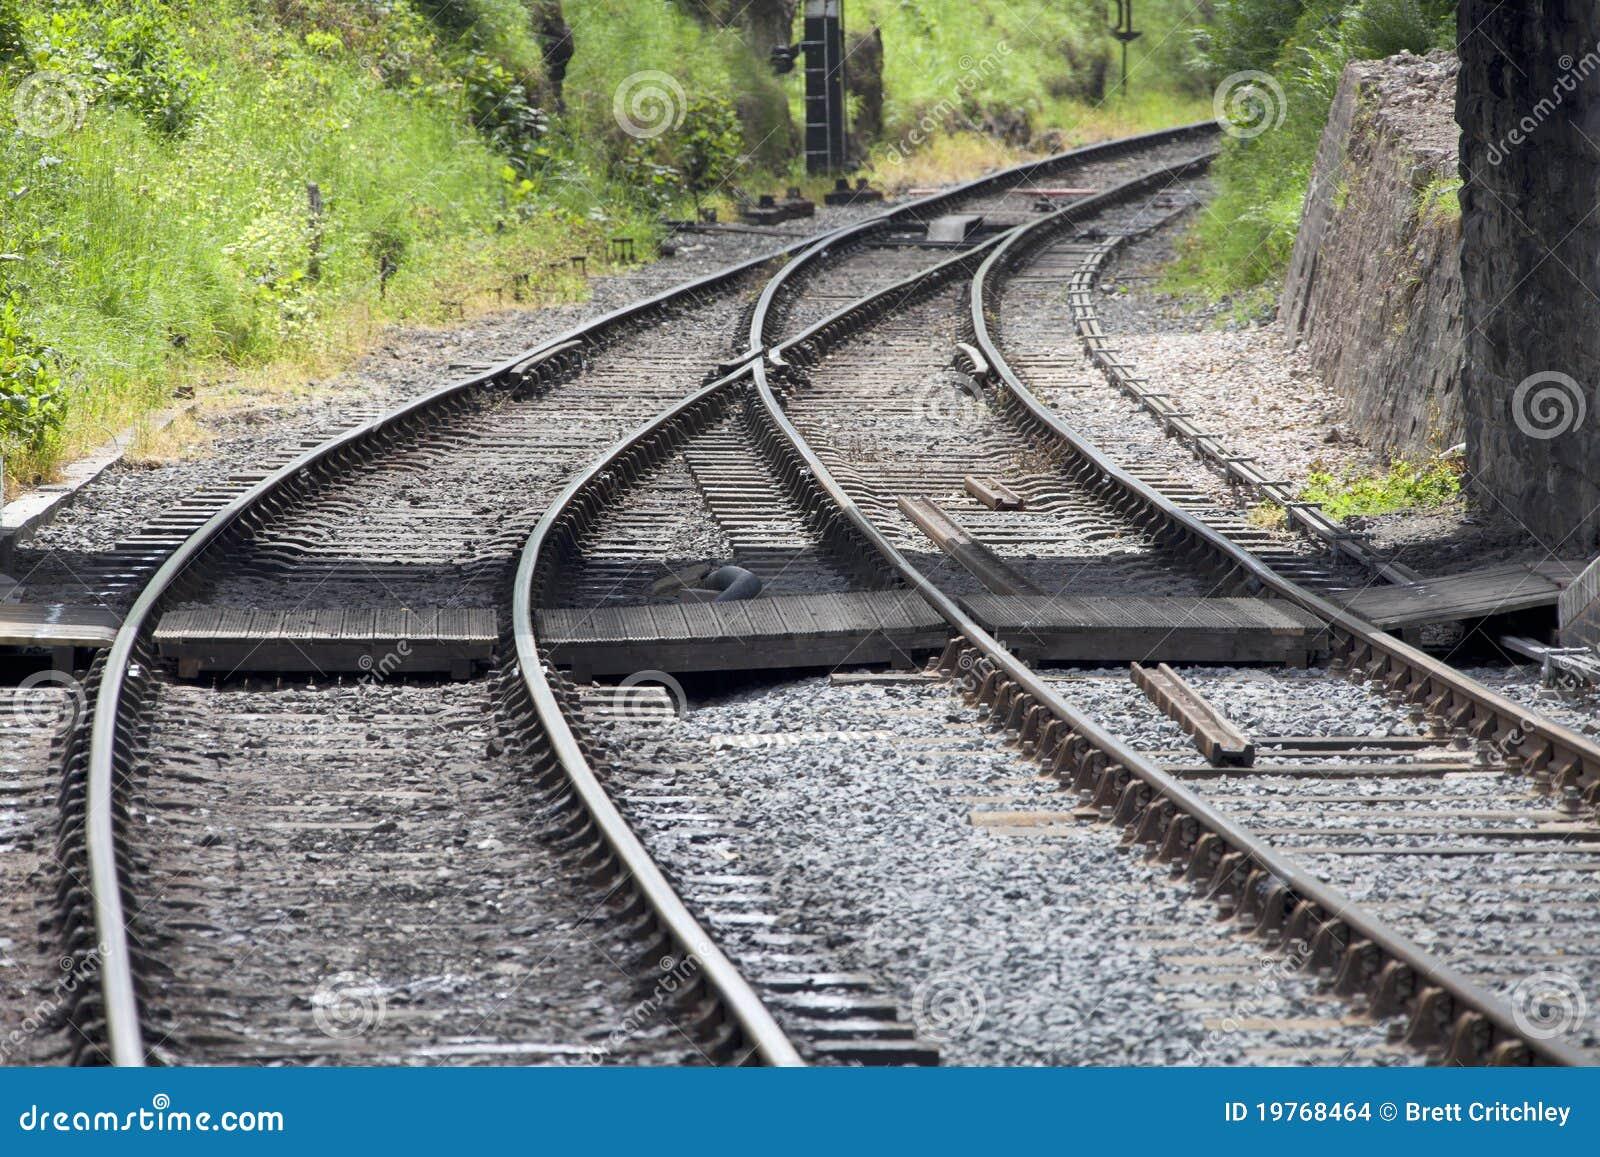 Railway Tracks To Where? stock photo. Image of empty